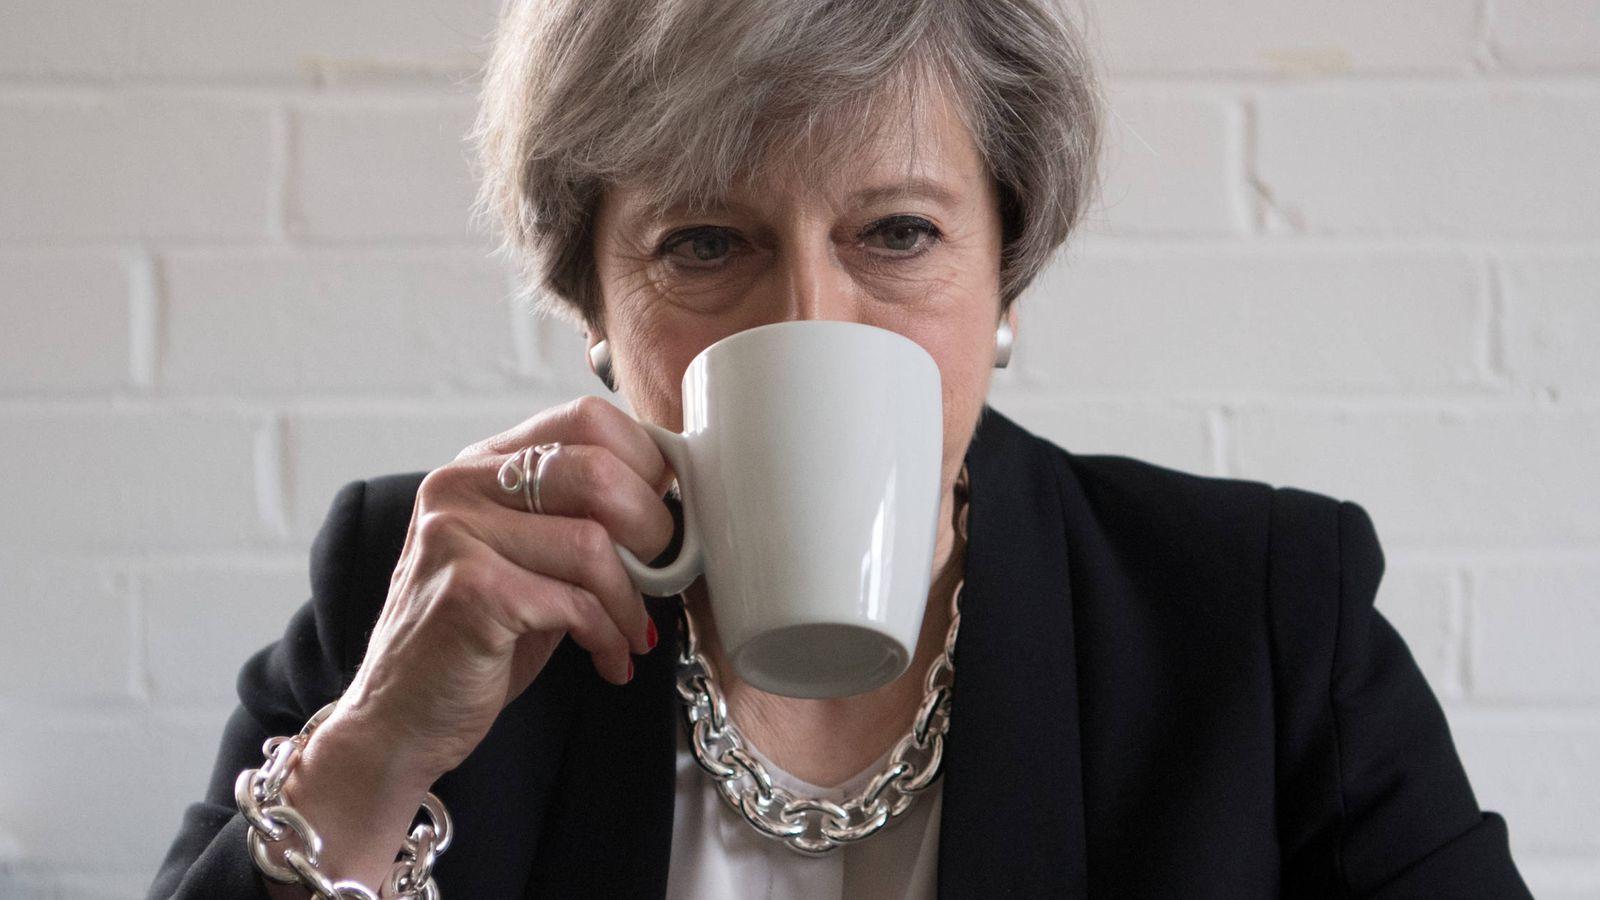 Foto: La primera ministra británica Theresa May durante un evento caritativo en Londres. (Reuters)